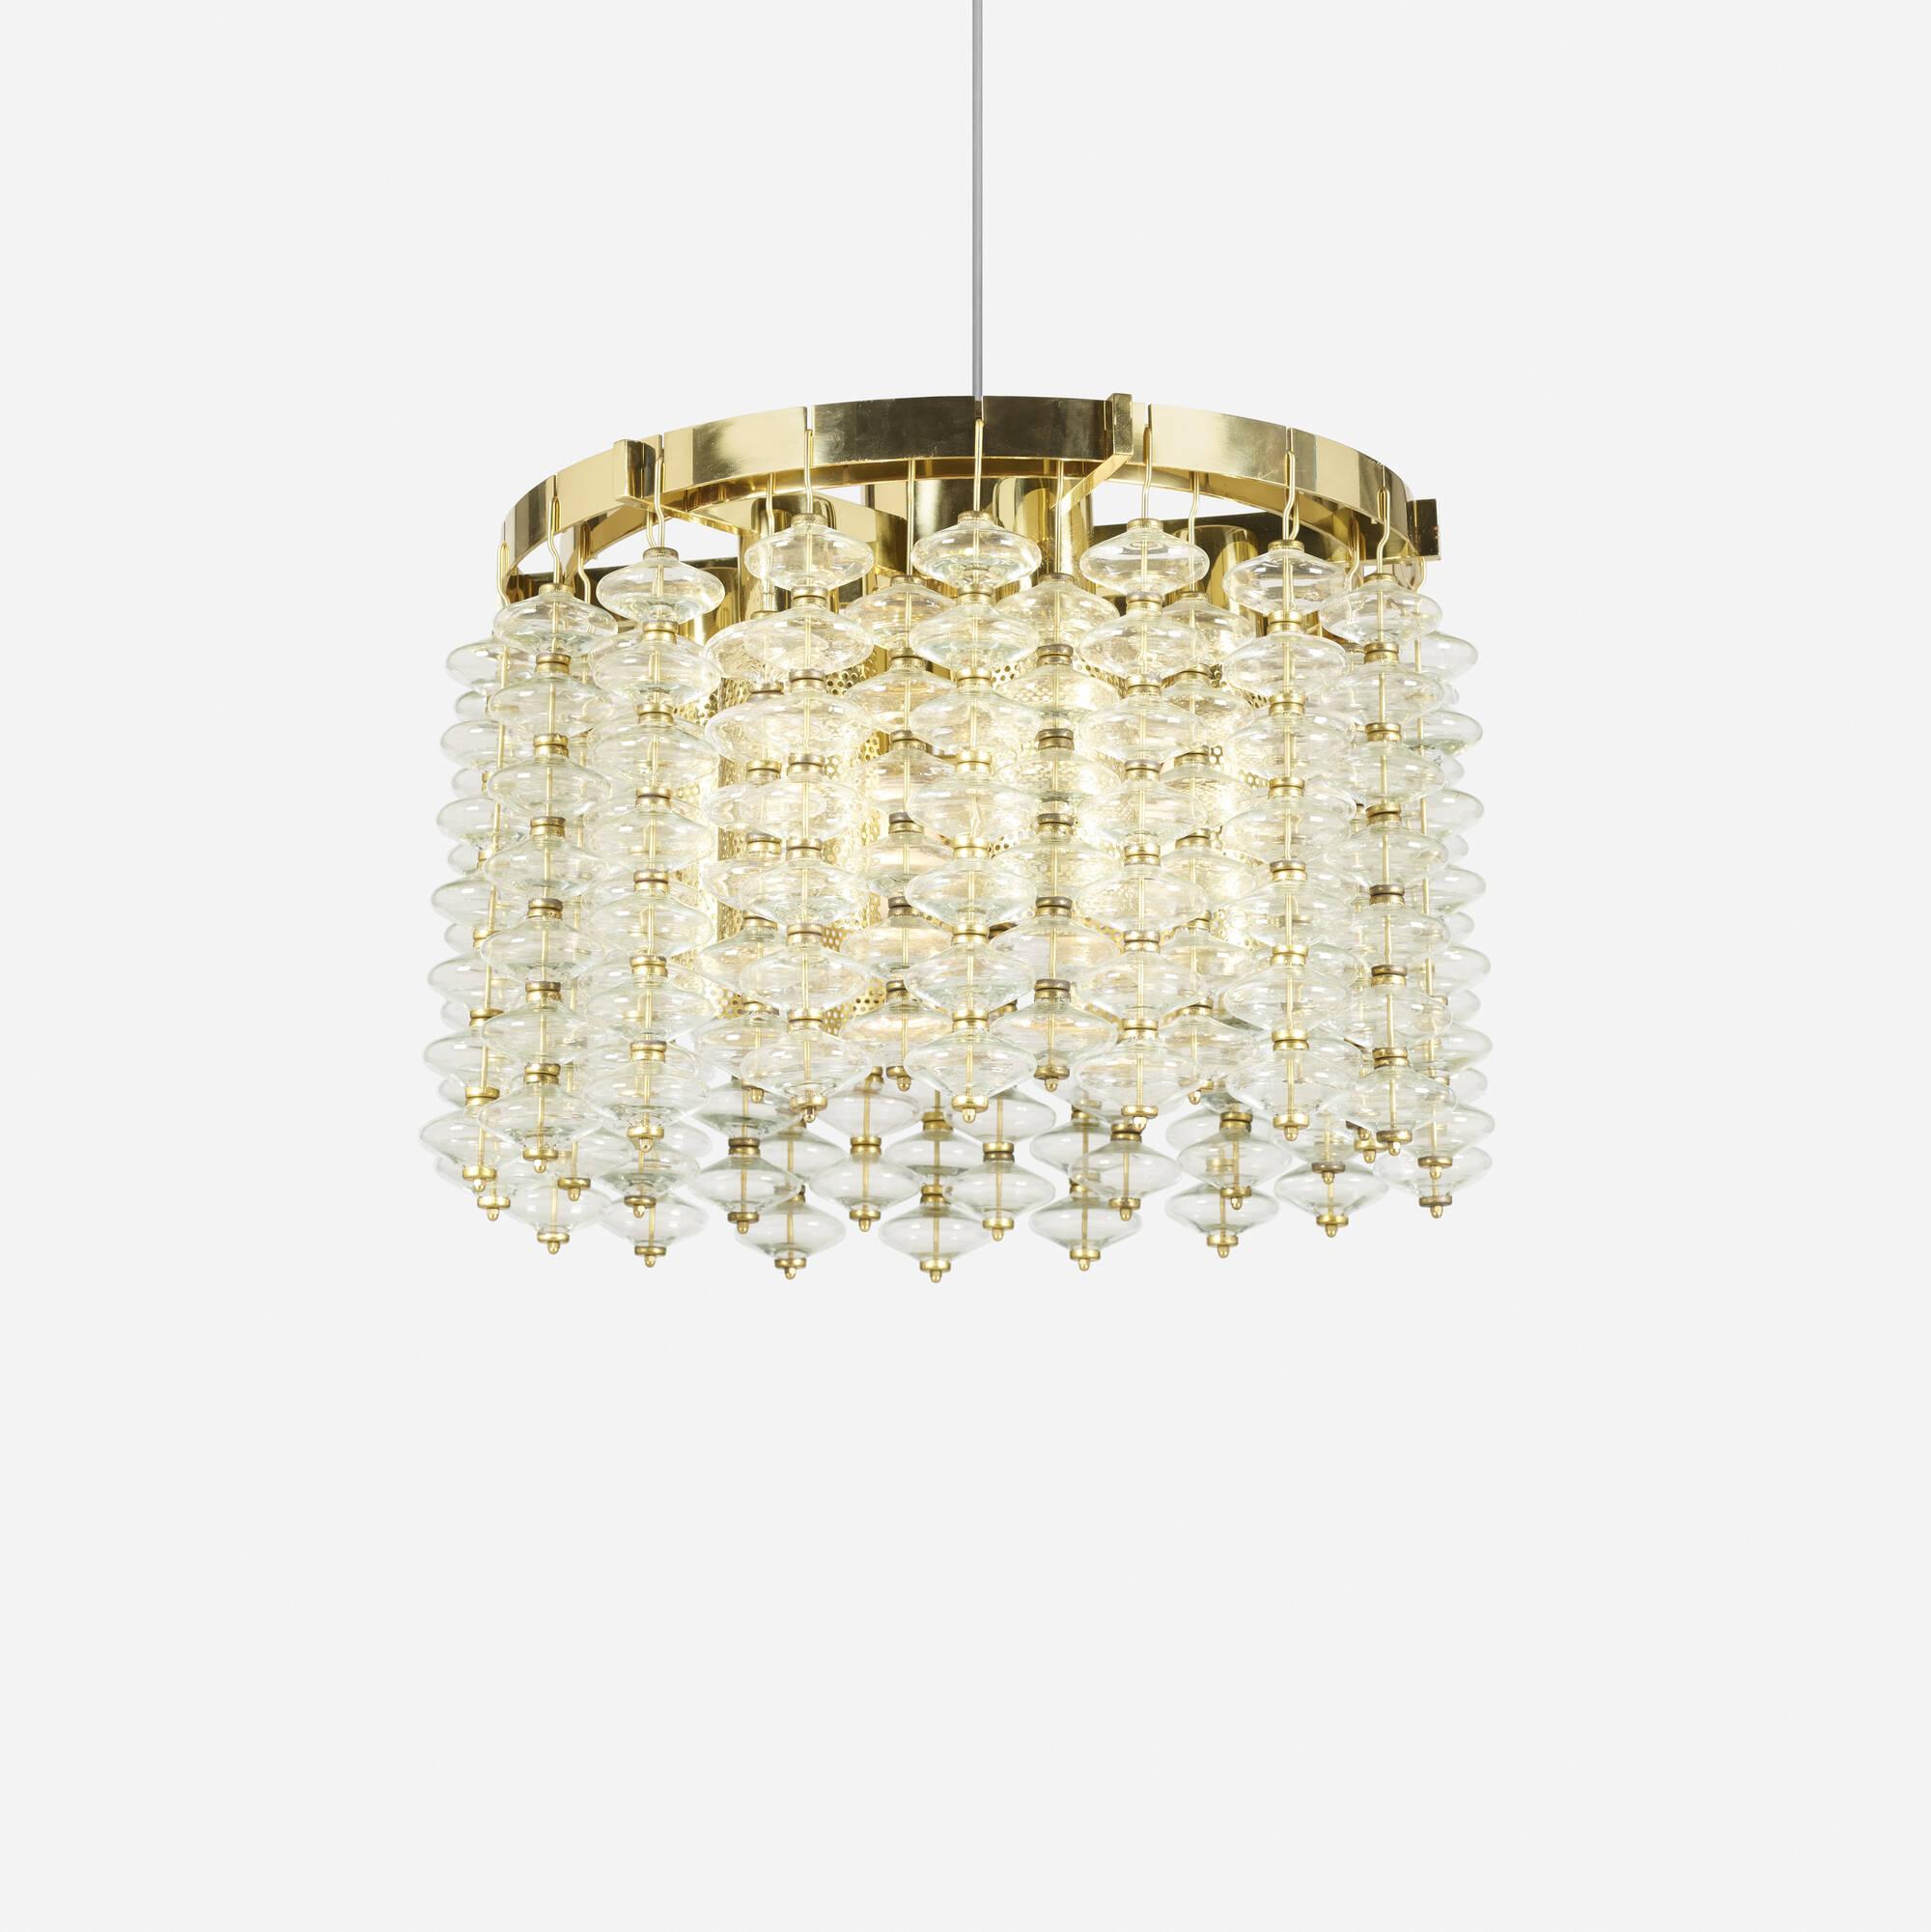 186: Hans-Agne Jakobsson / chandelier (1 of 3)